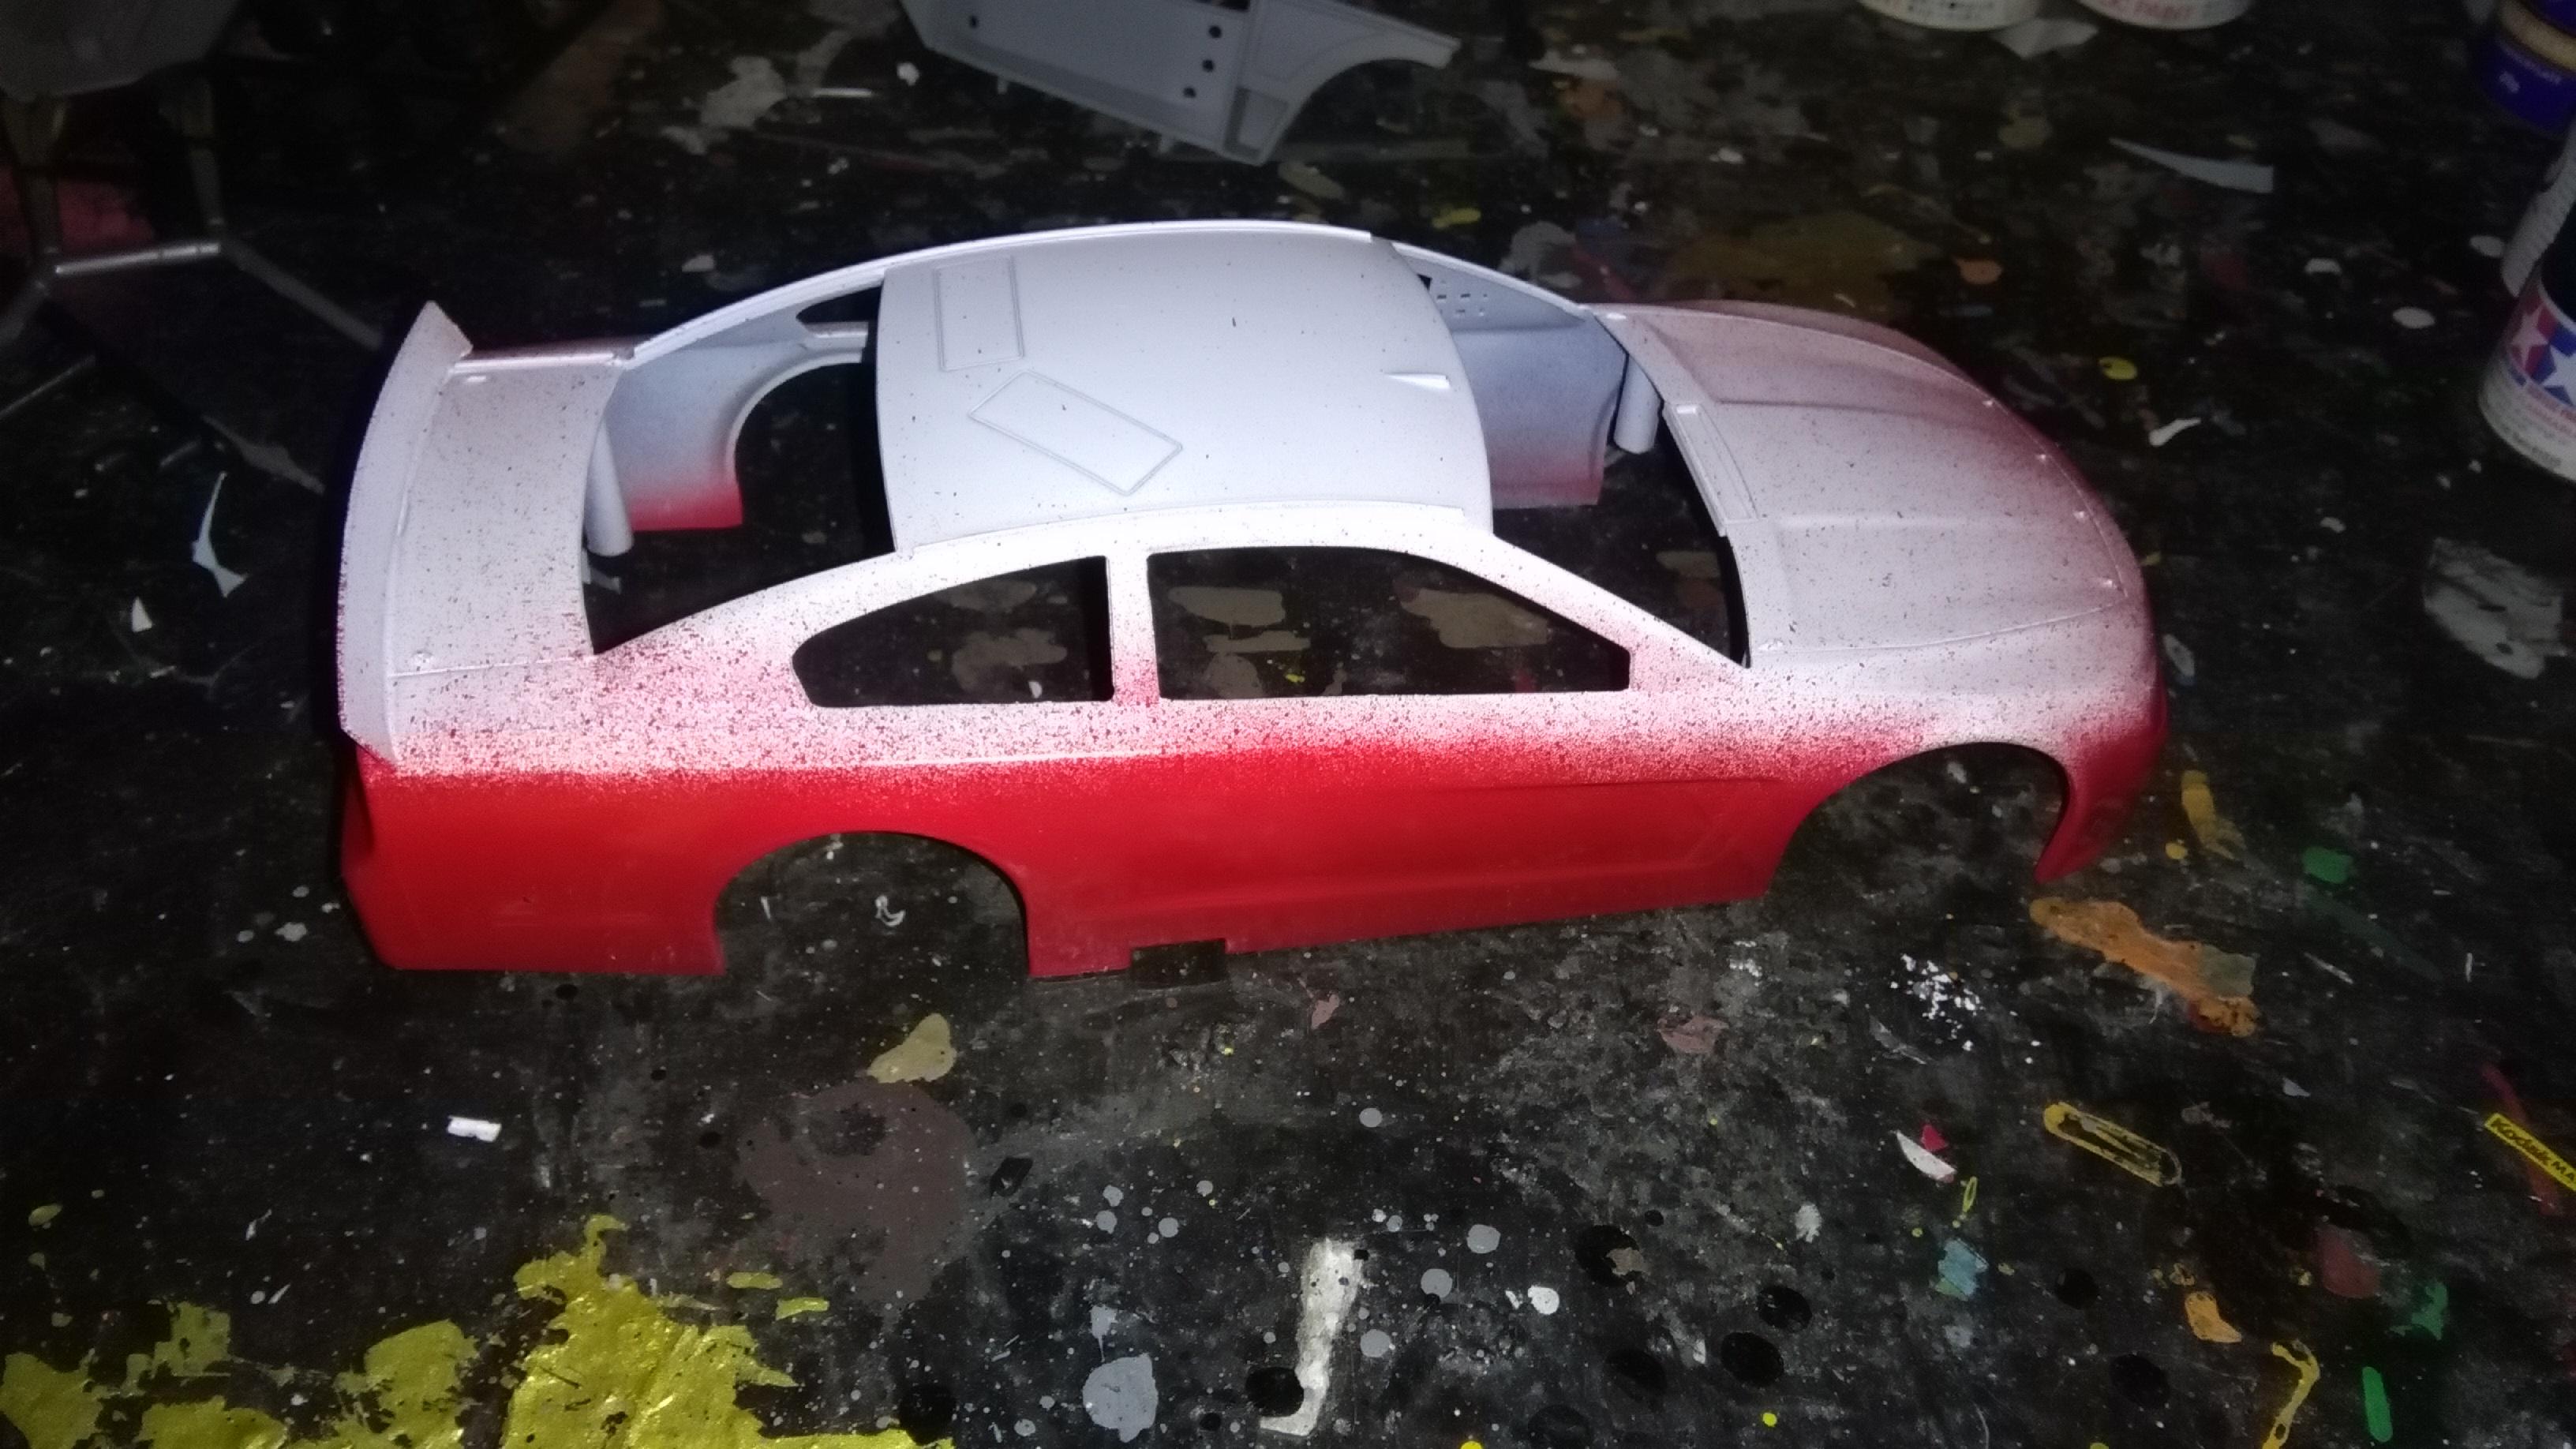 Chevrolet SS 2015 #24 Jeff Gordon 3M 180627IMG20170317213710